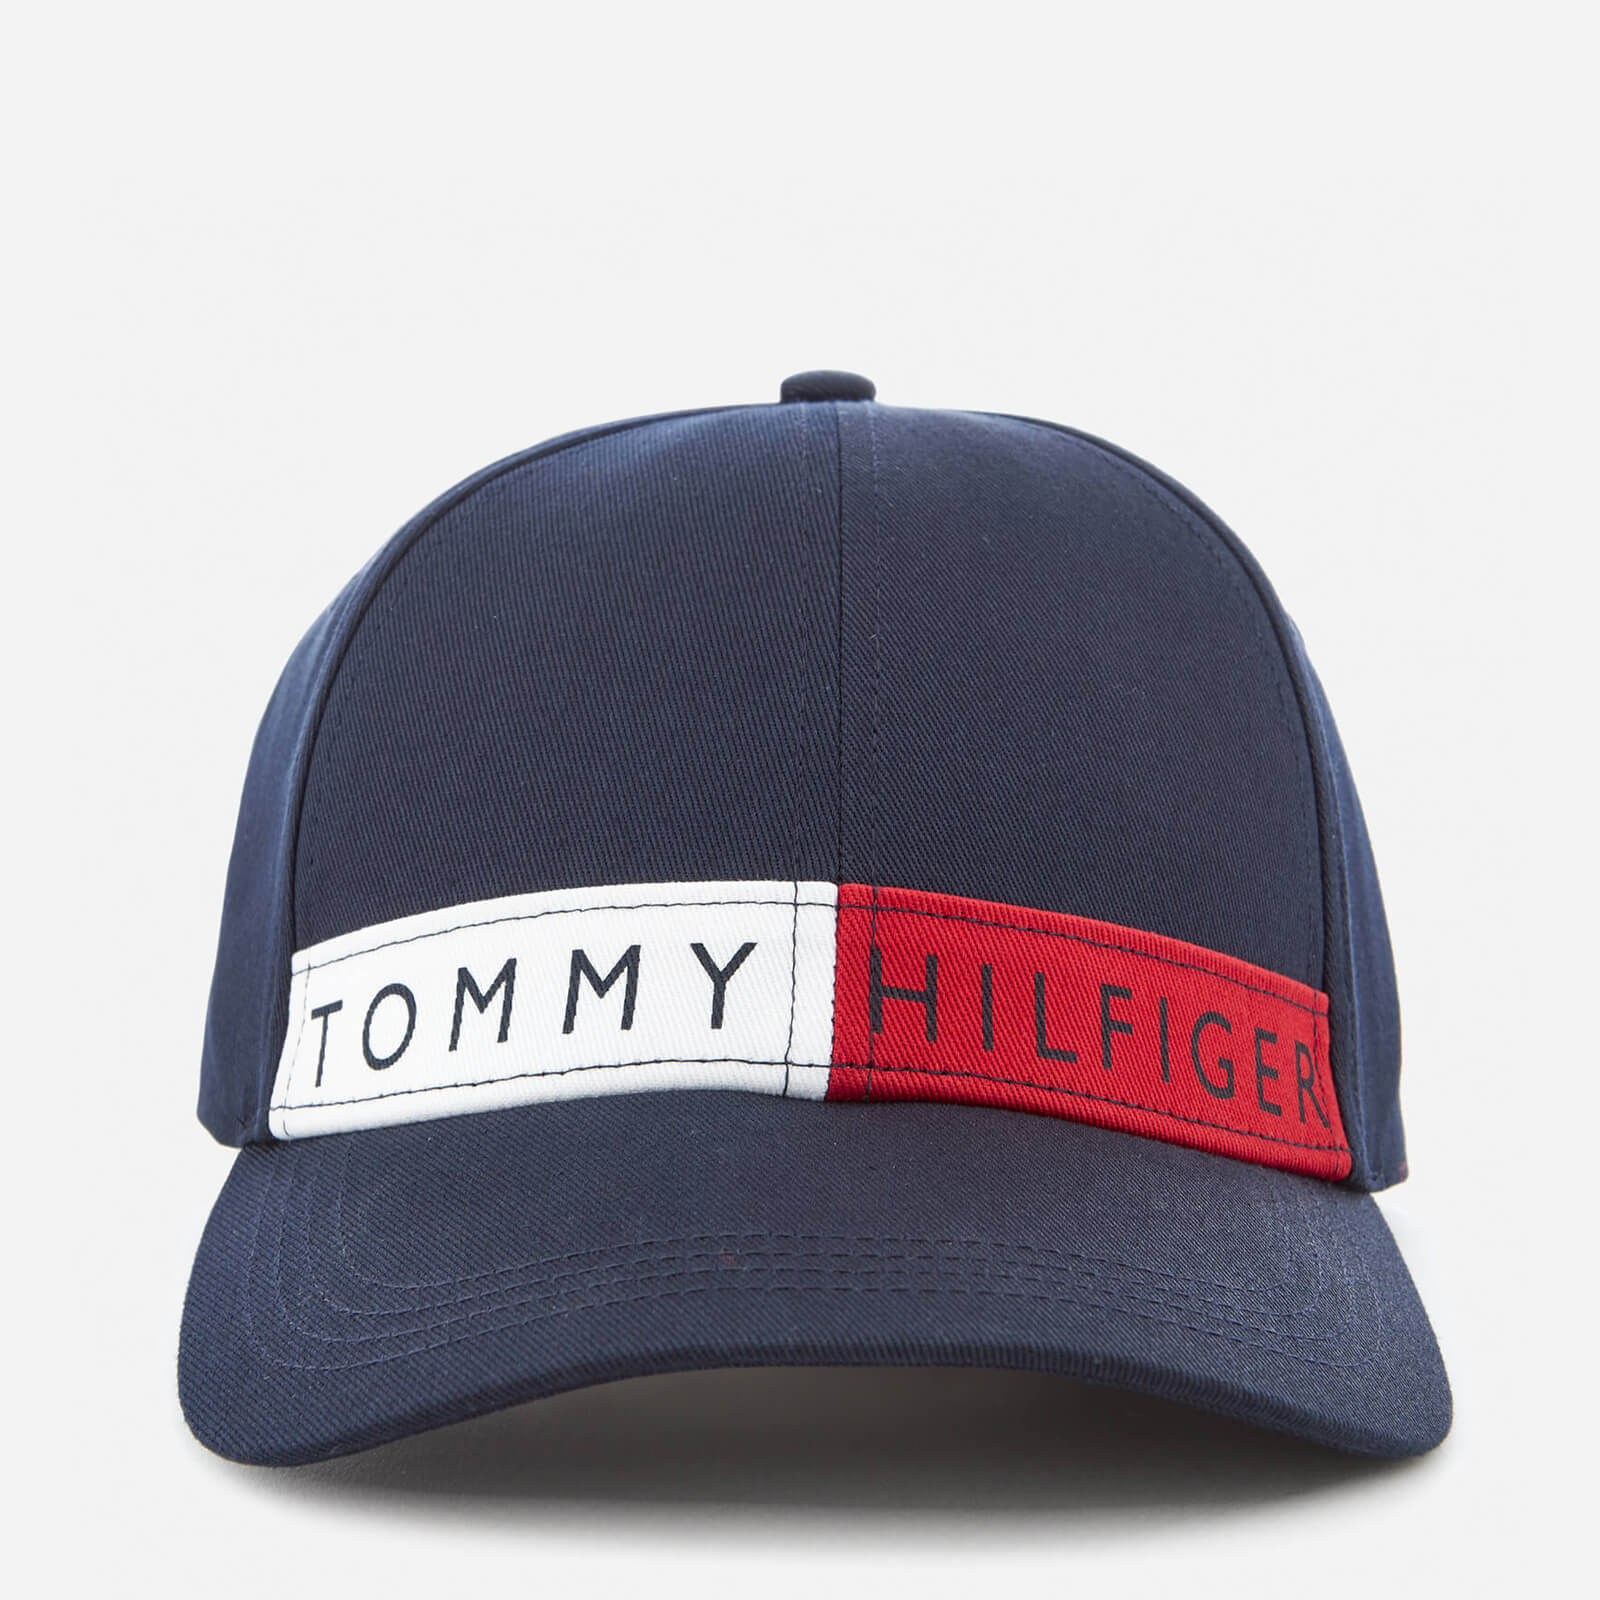 b775f13f04be6 Tommy Hilfiger Women s Logo Flag Cap - Navy Clothing